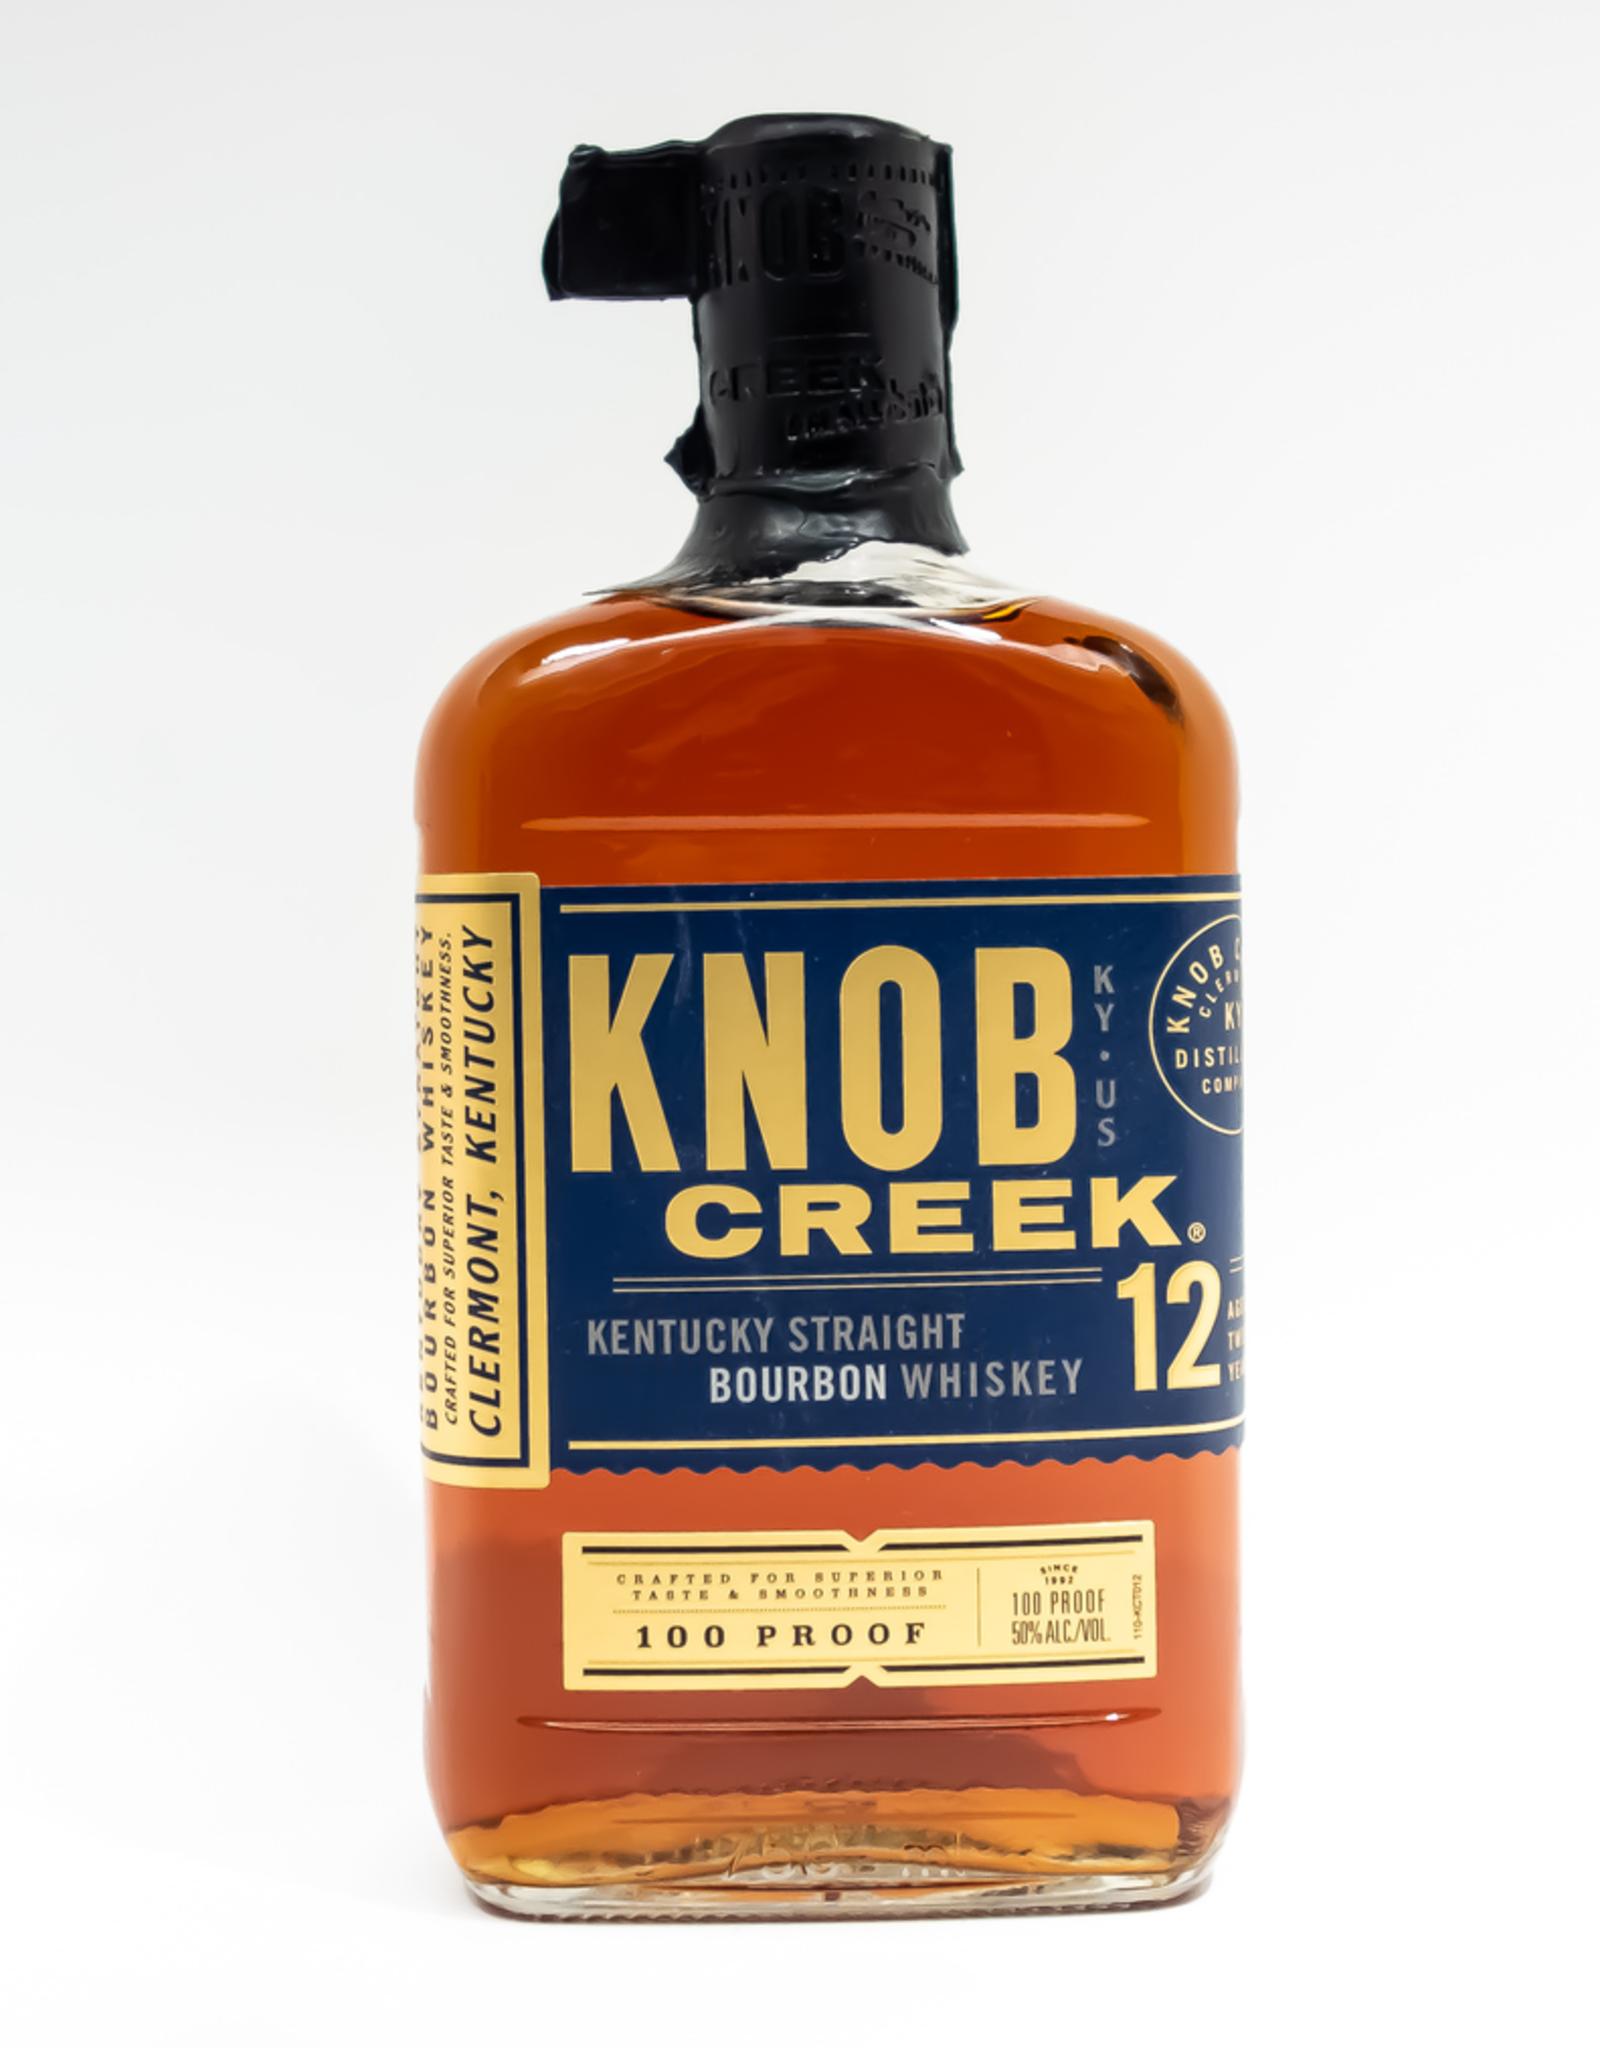 Spirits-Whiskey-Bourbon Knob Creek 12 Year Kentucky Straight Bourbon Whiskey 750ml